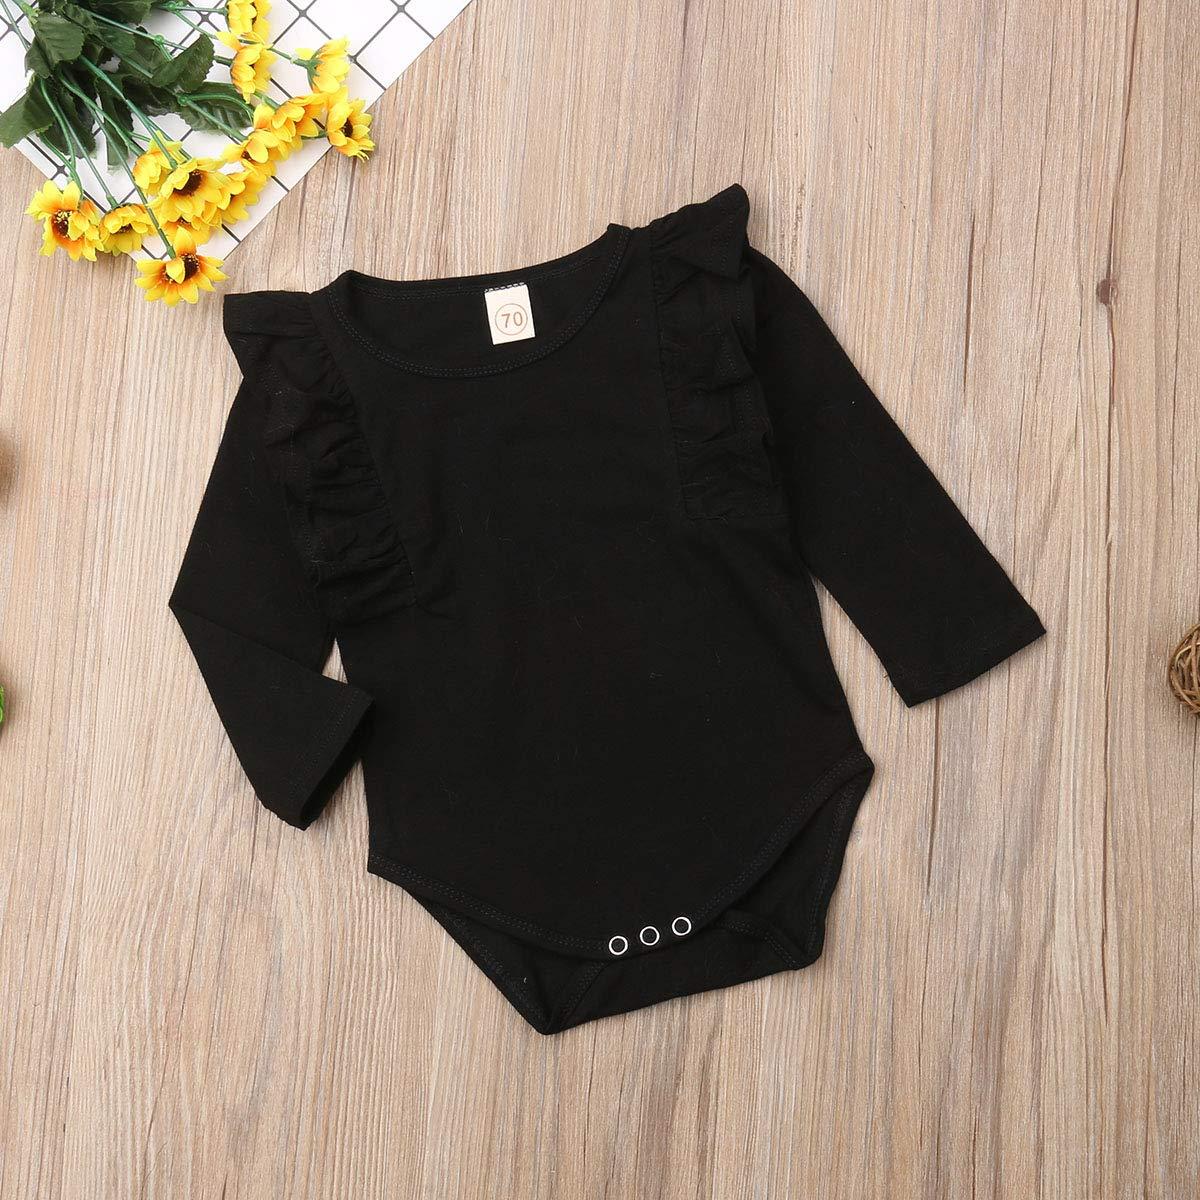 324a481131b Amazon.com  FOYUN Infant Baby Girls 5 Solid Colors Long Sleeve Ruffle  Bodysuit Romper Jumpsuit  Clothing